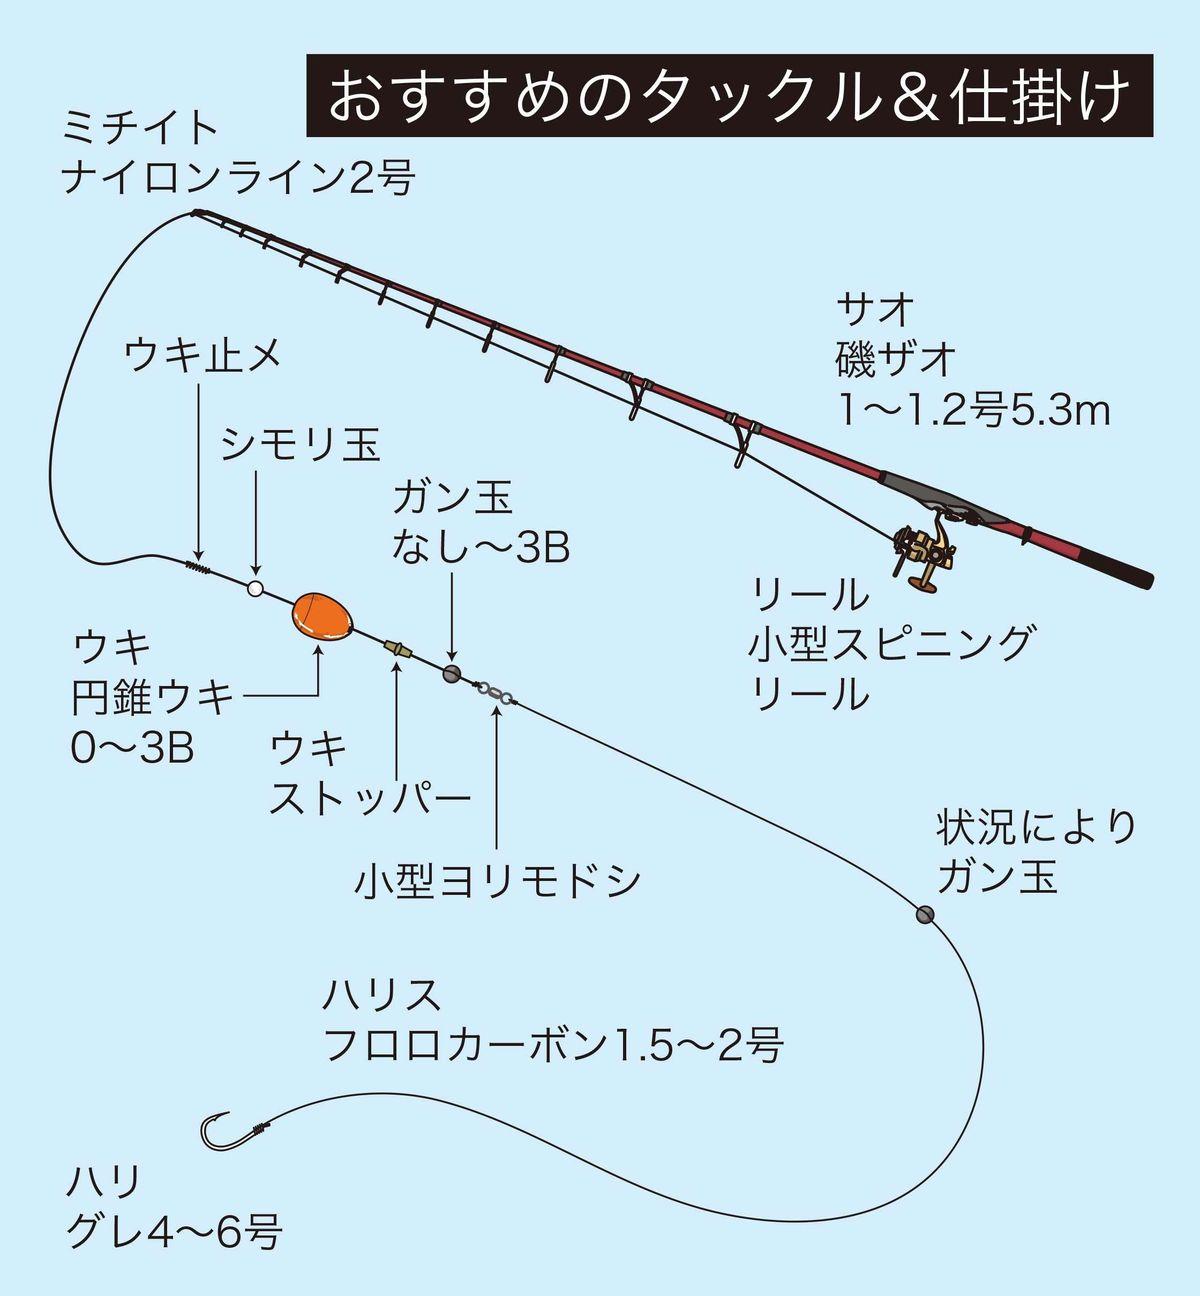 078-101_zenkokutsuribaGW06_cs6 (5)